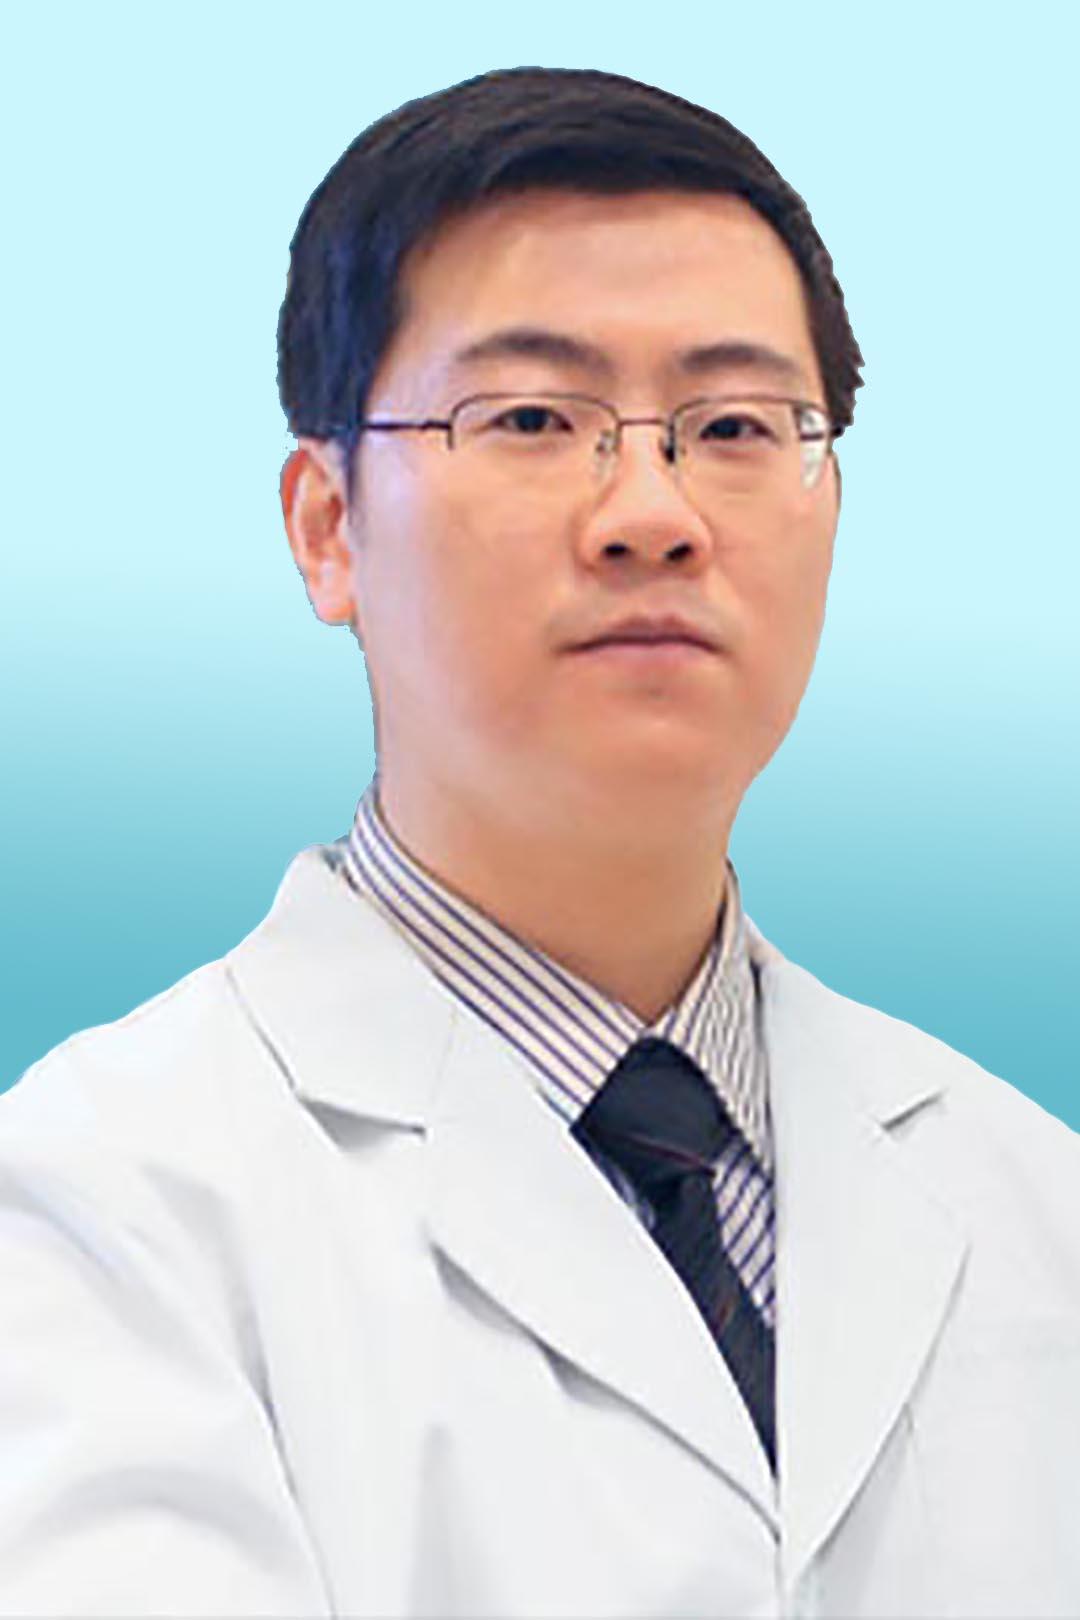 Врач рефлексотерапевт Гань Цзюньда